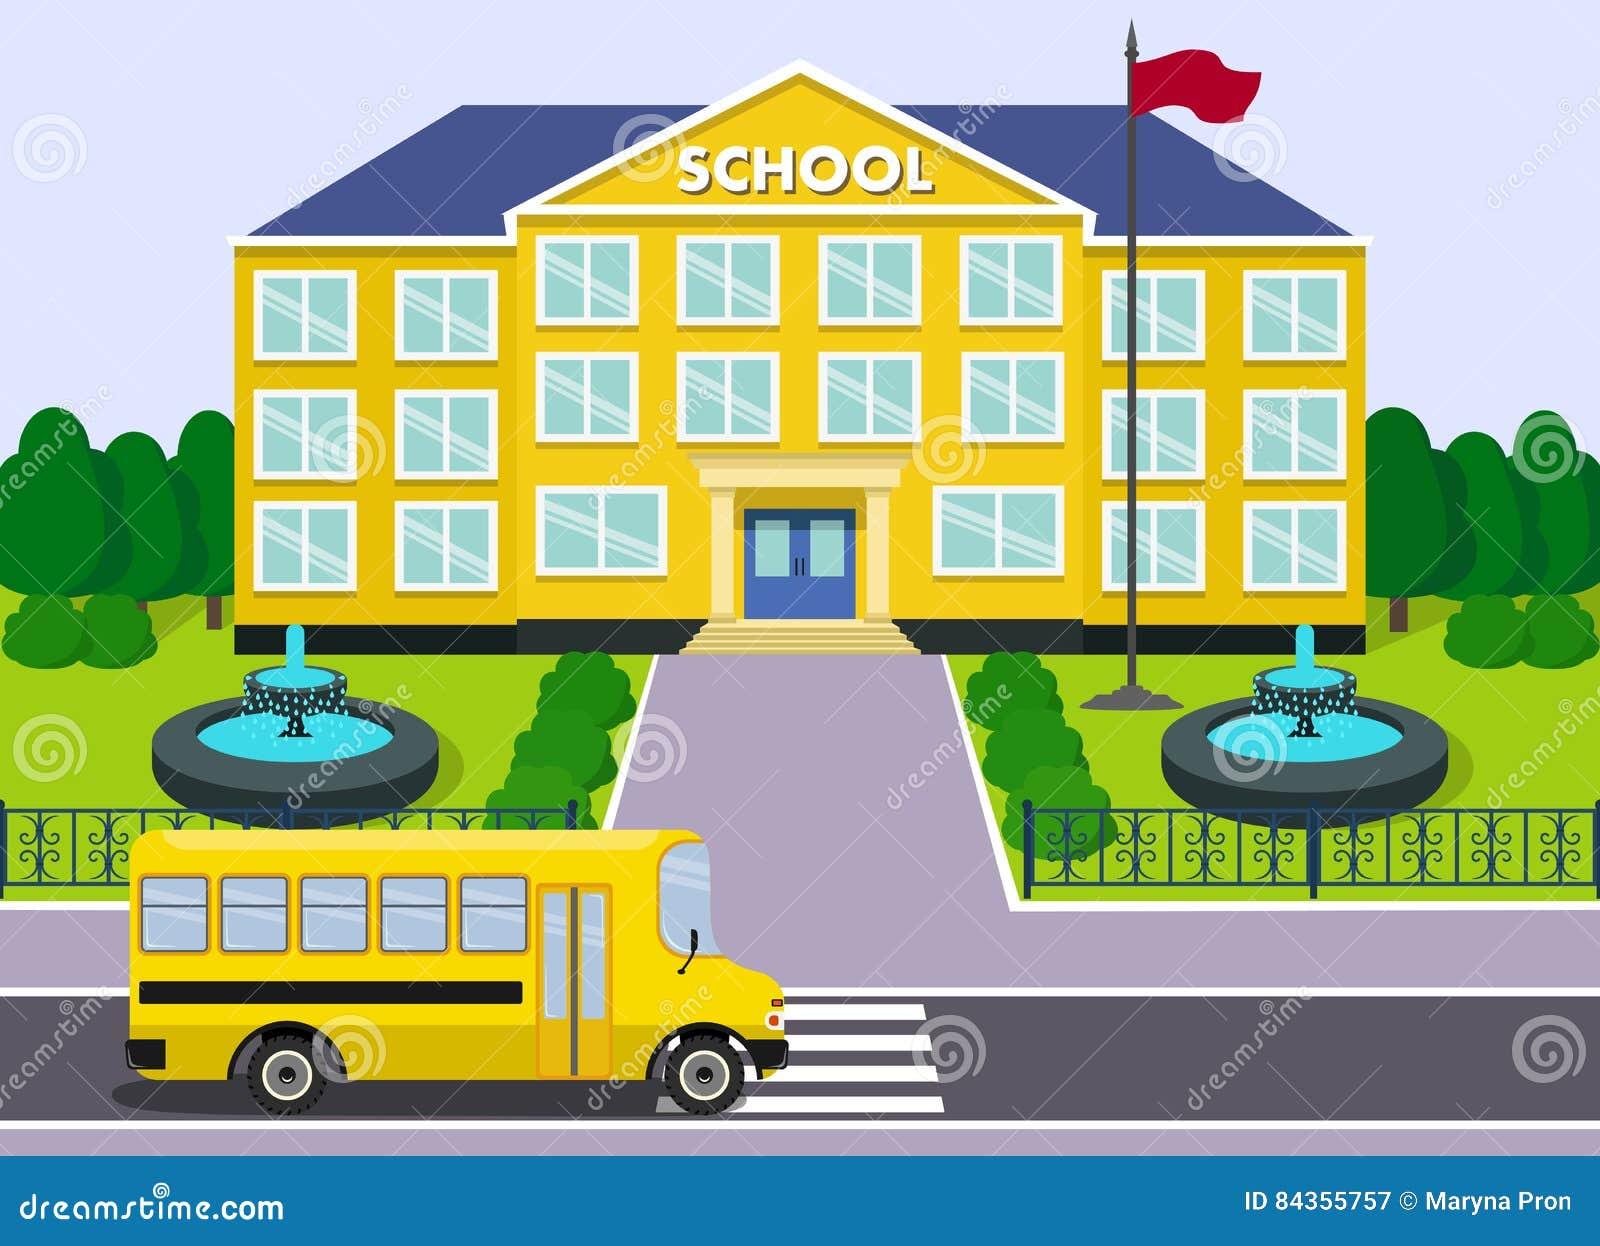 School Building And Bus. Vector Graphic. Stock Vector ...